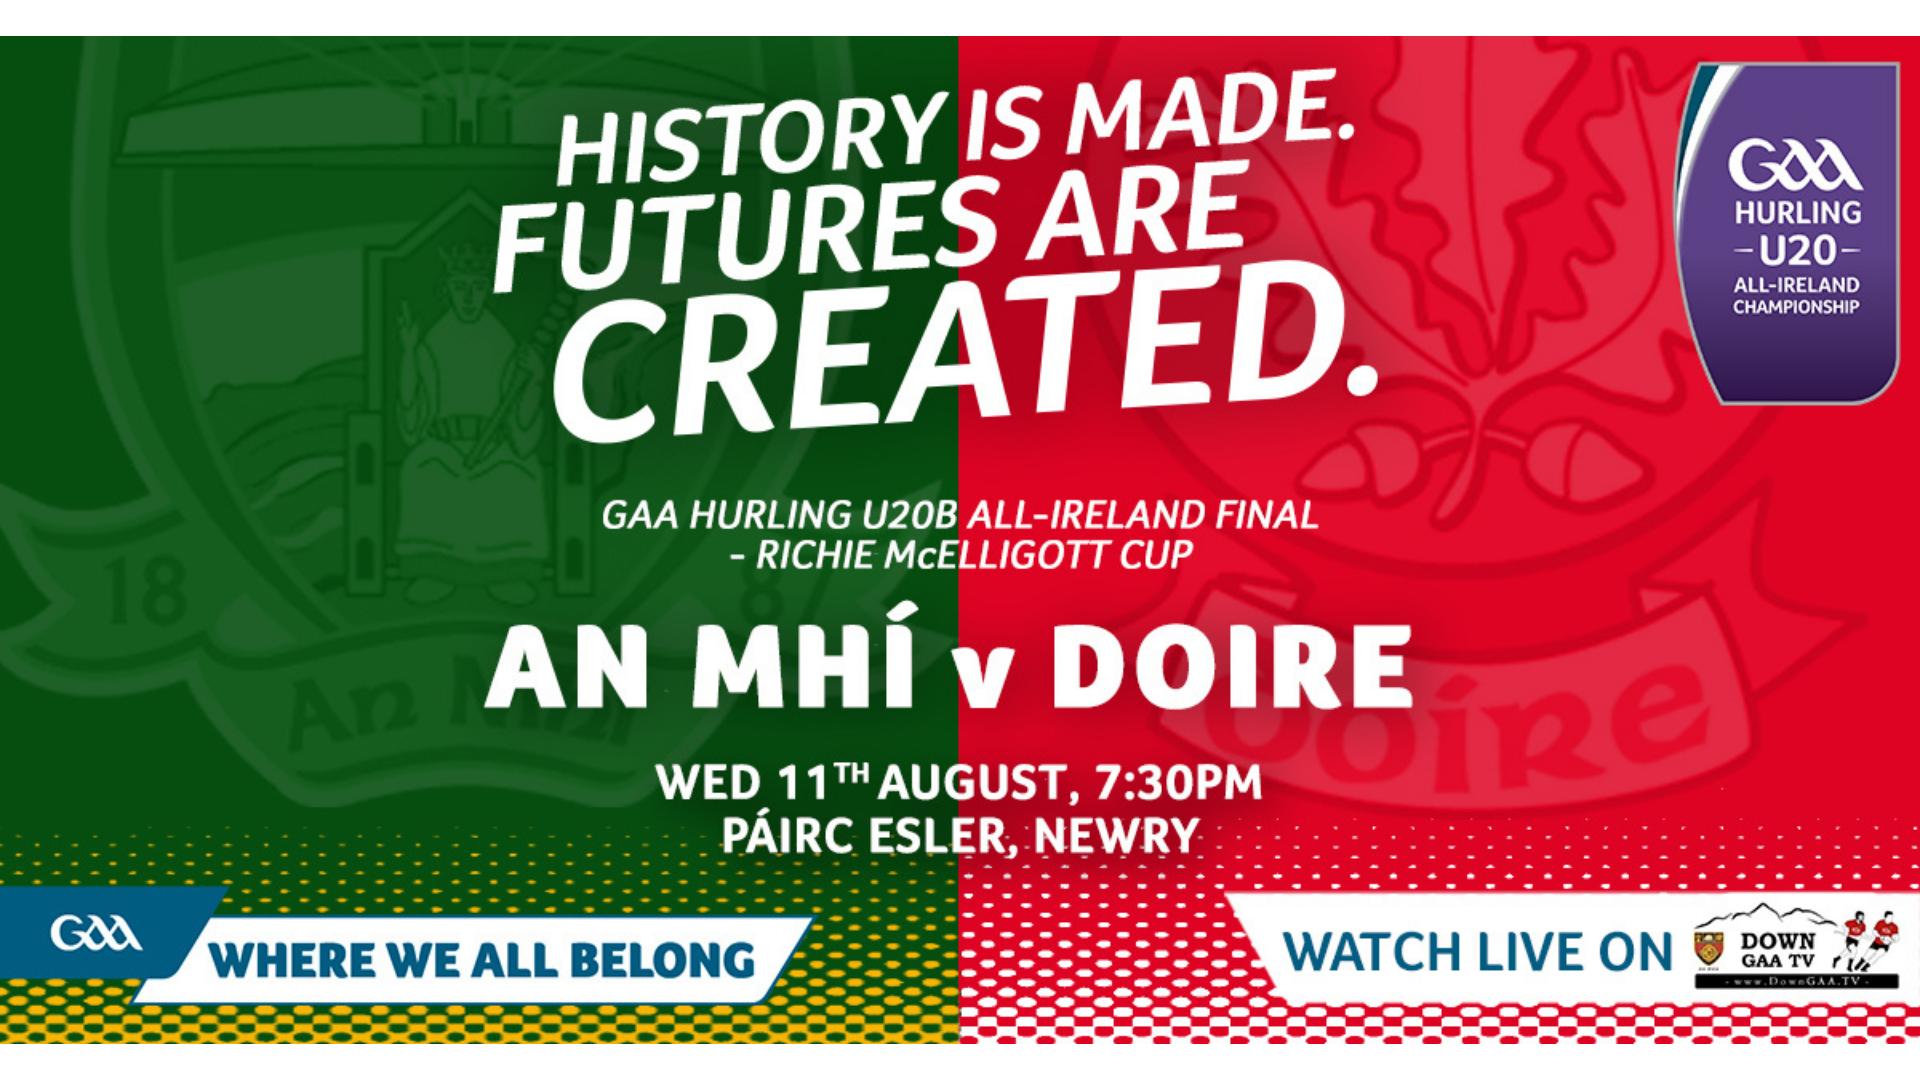 GAA Hurling All-Ireland U20B Championship Final – Richie McElligott Cup